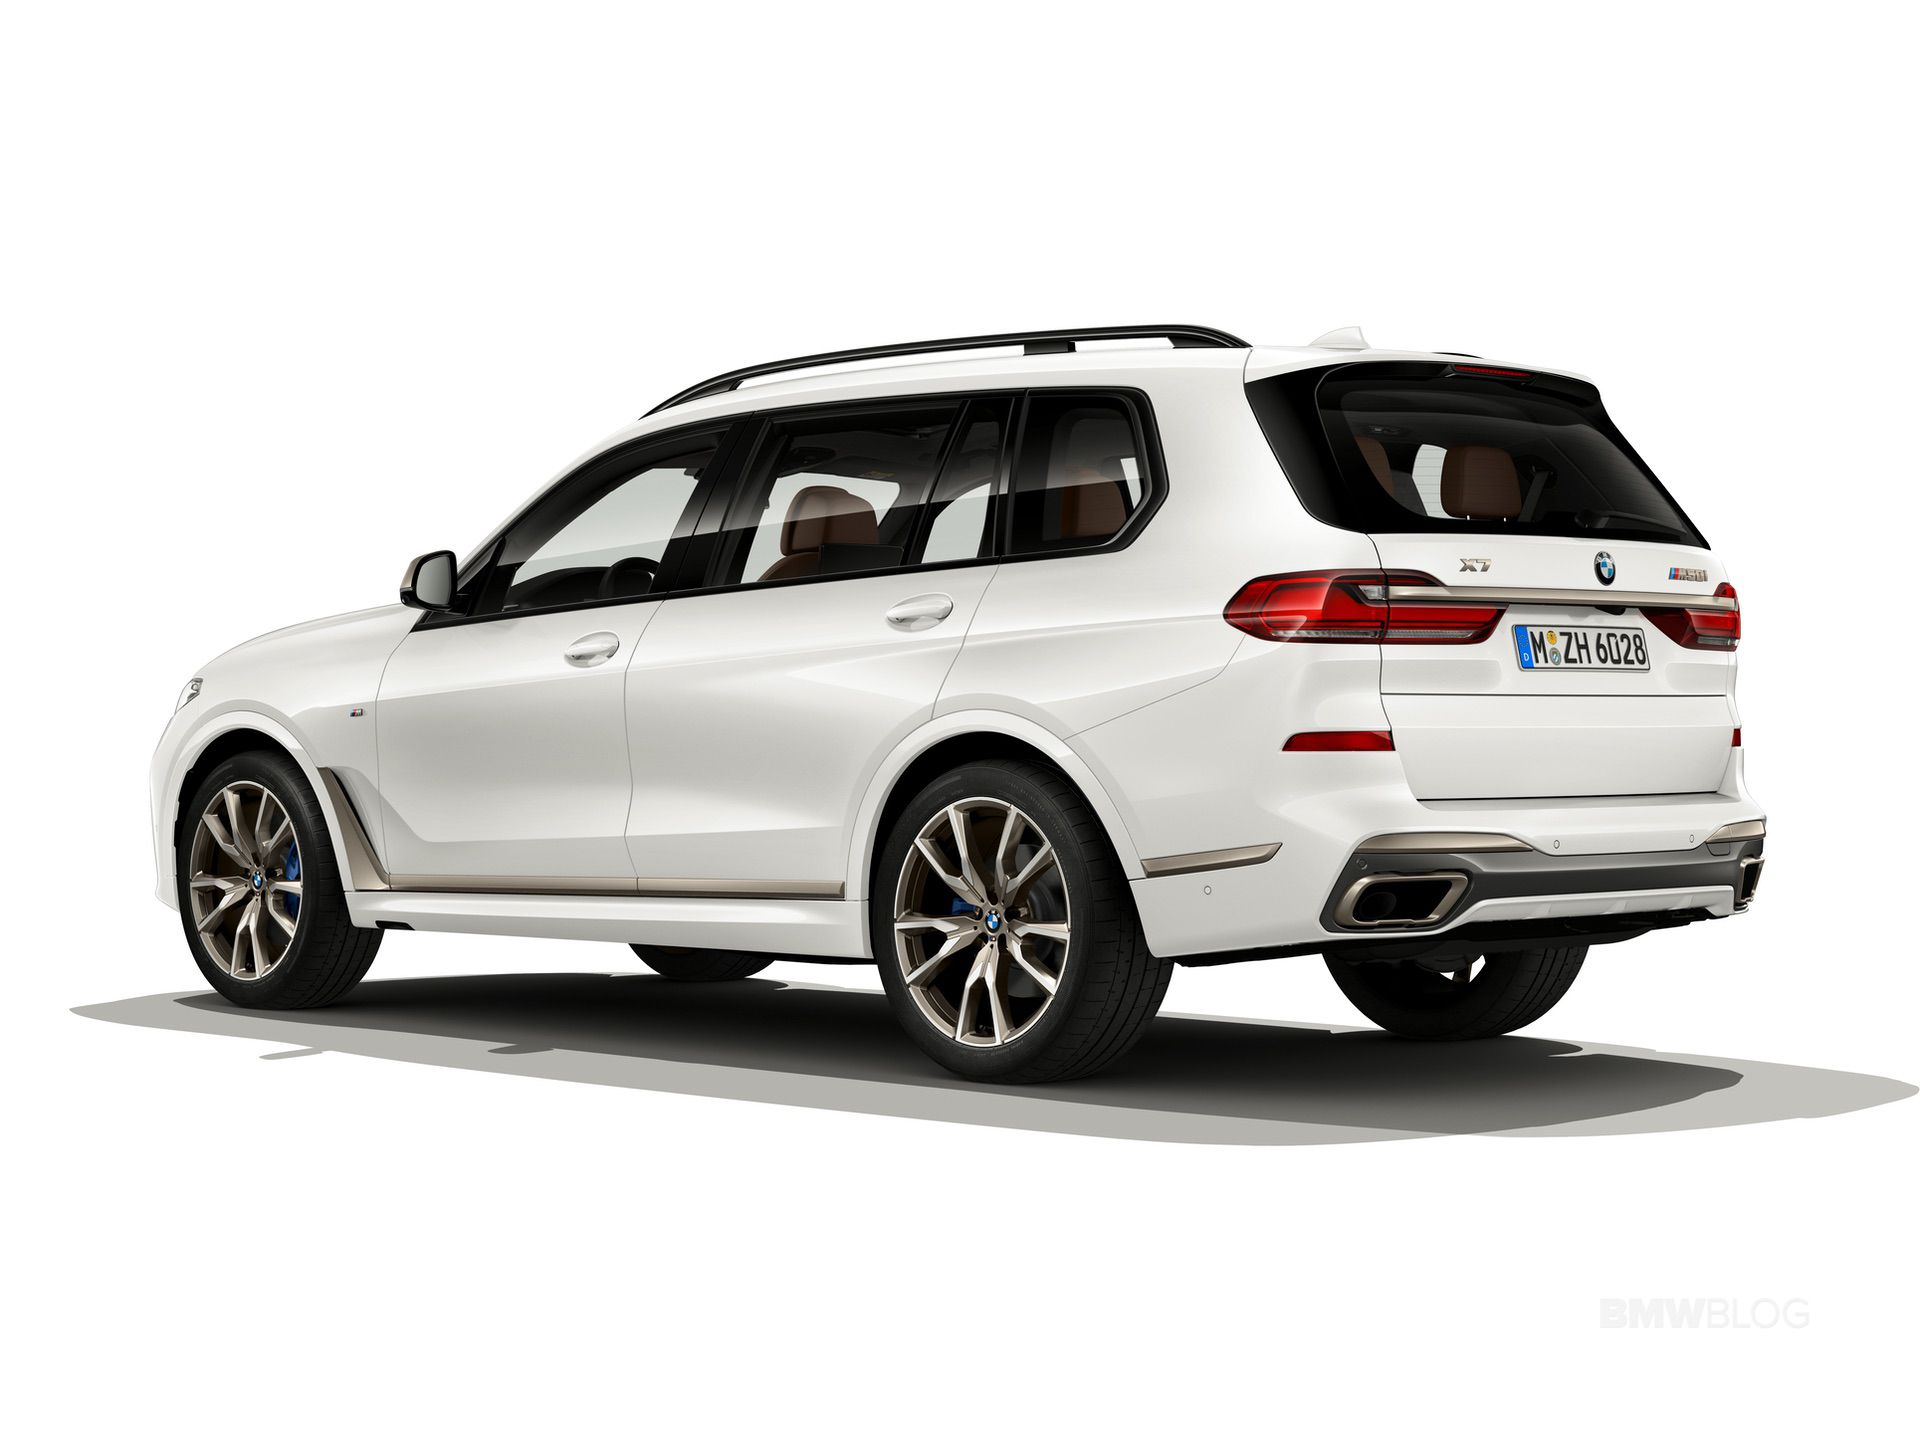 2020 BMW X7 Suv Series Engine